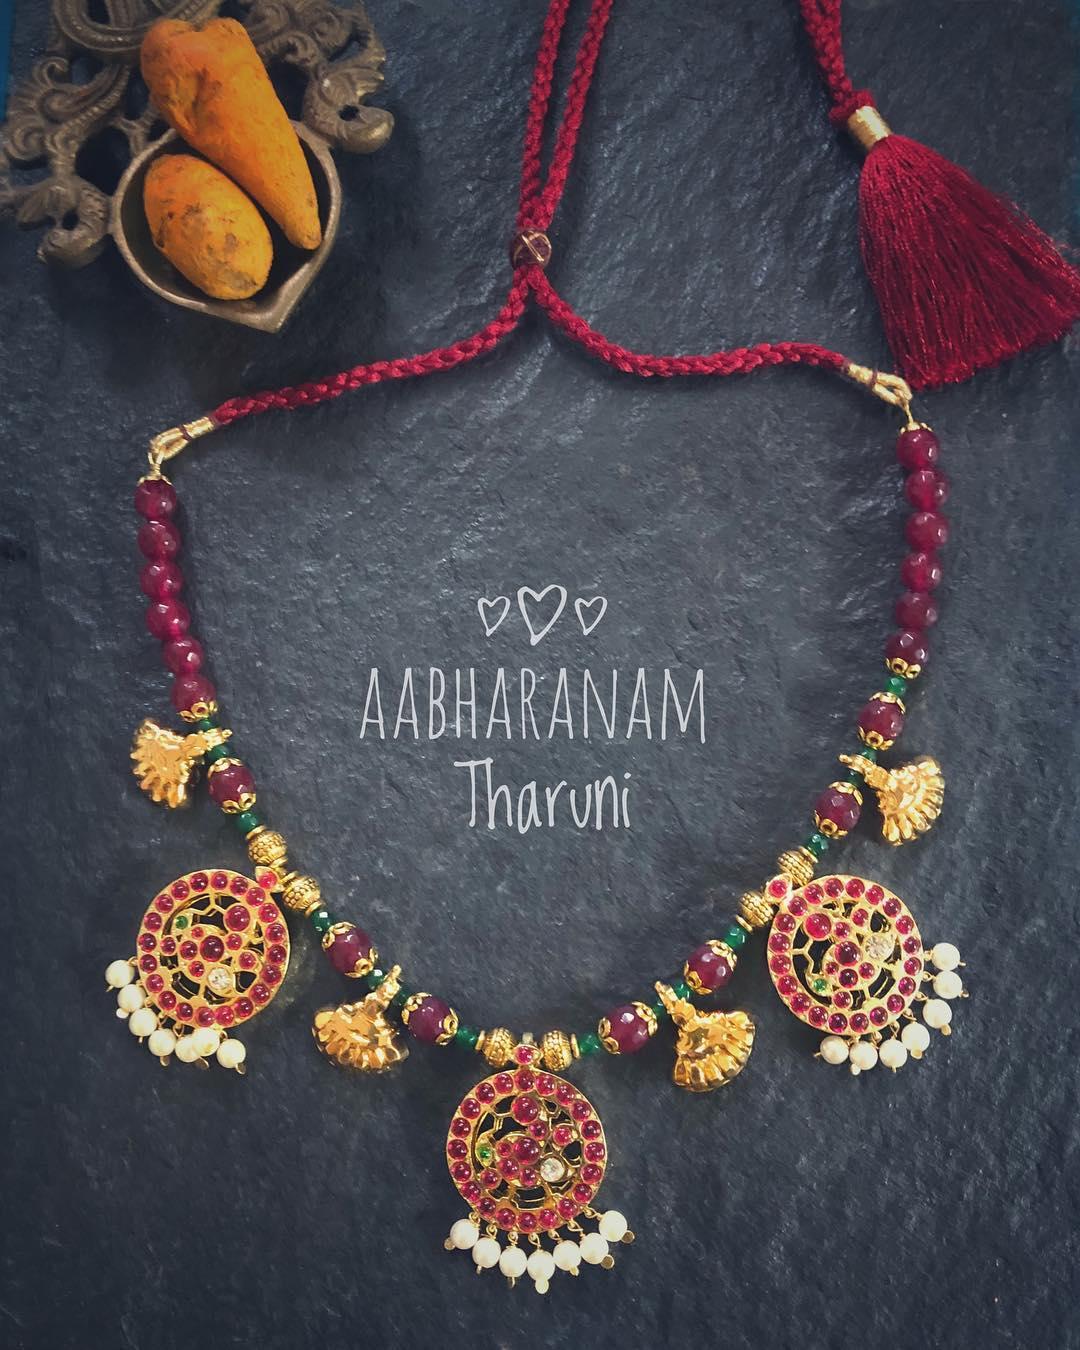 Beautiful Beaded Necklace From Abharanam